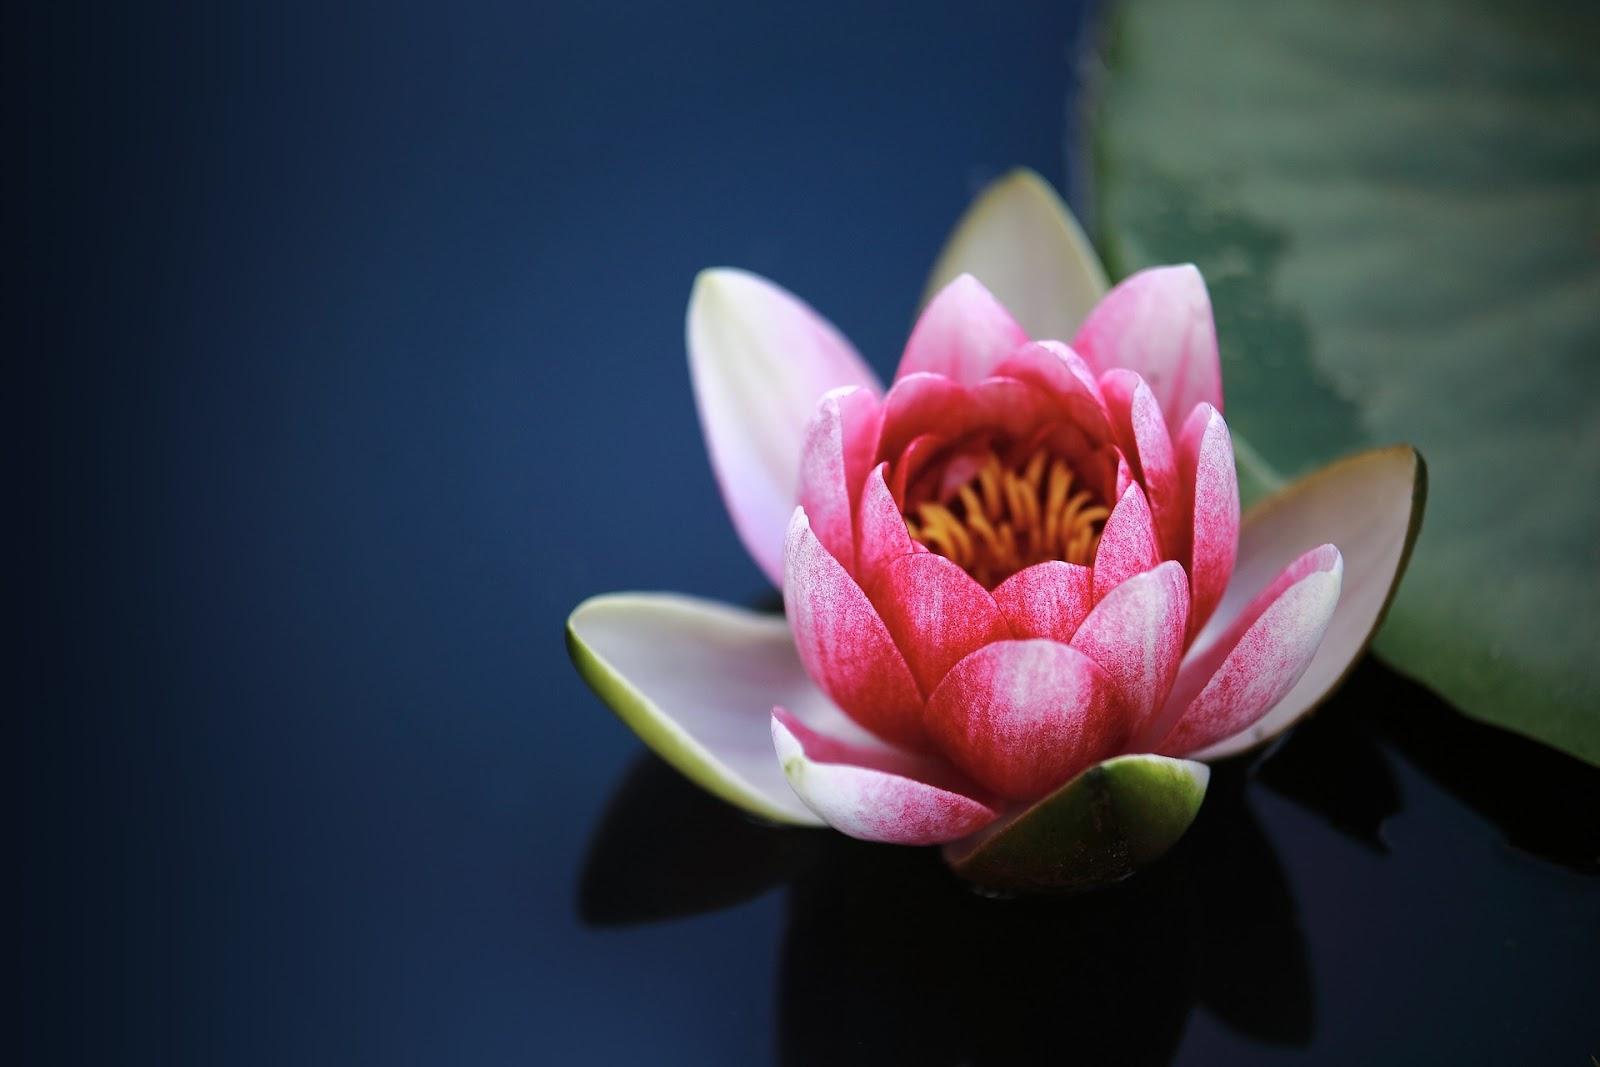 di postingan kali ini akan ada banyak bunga teratai yang cantik dan indah 15+ Gambar Bunga Teratai Indah